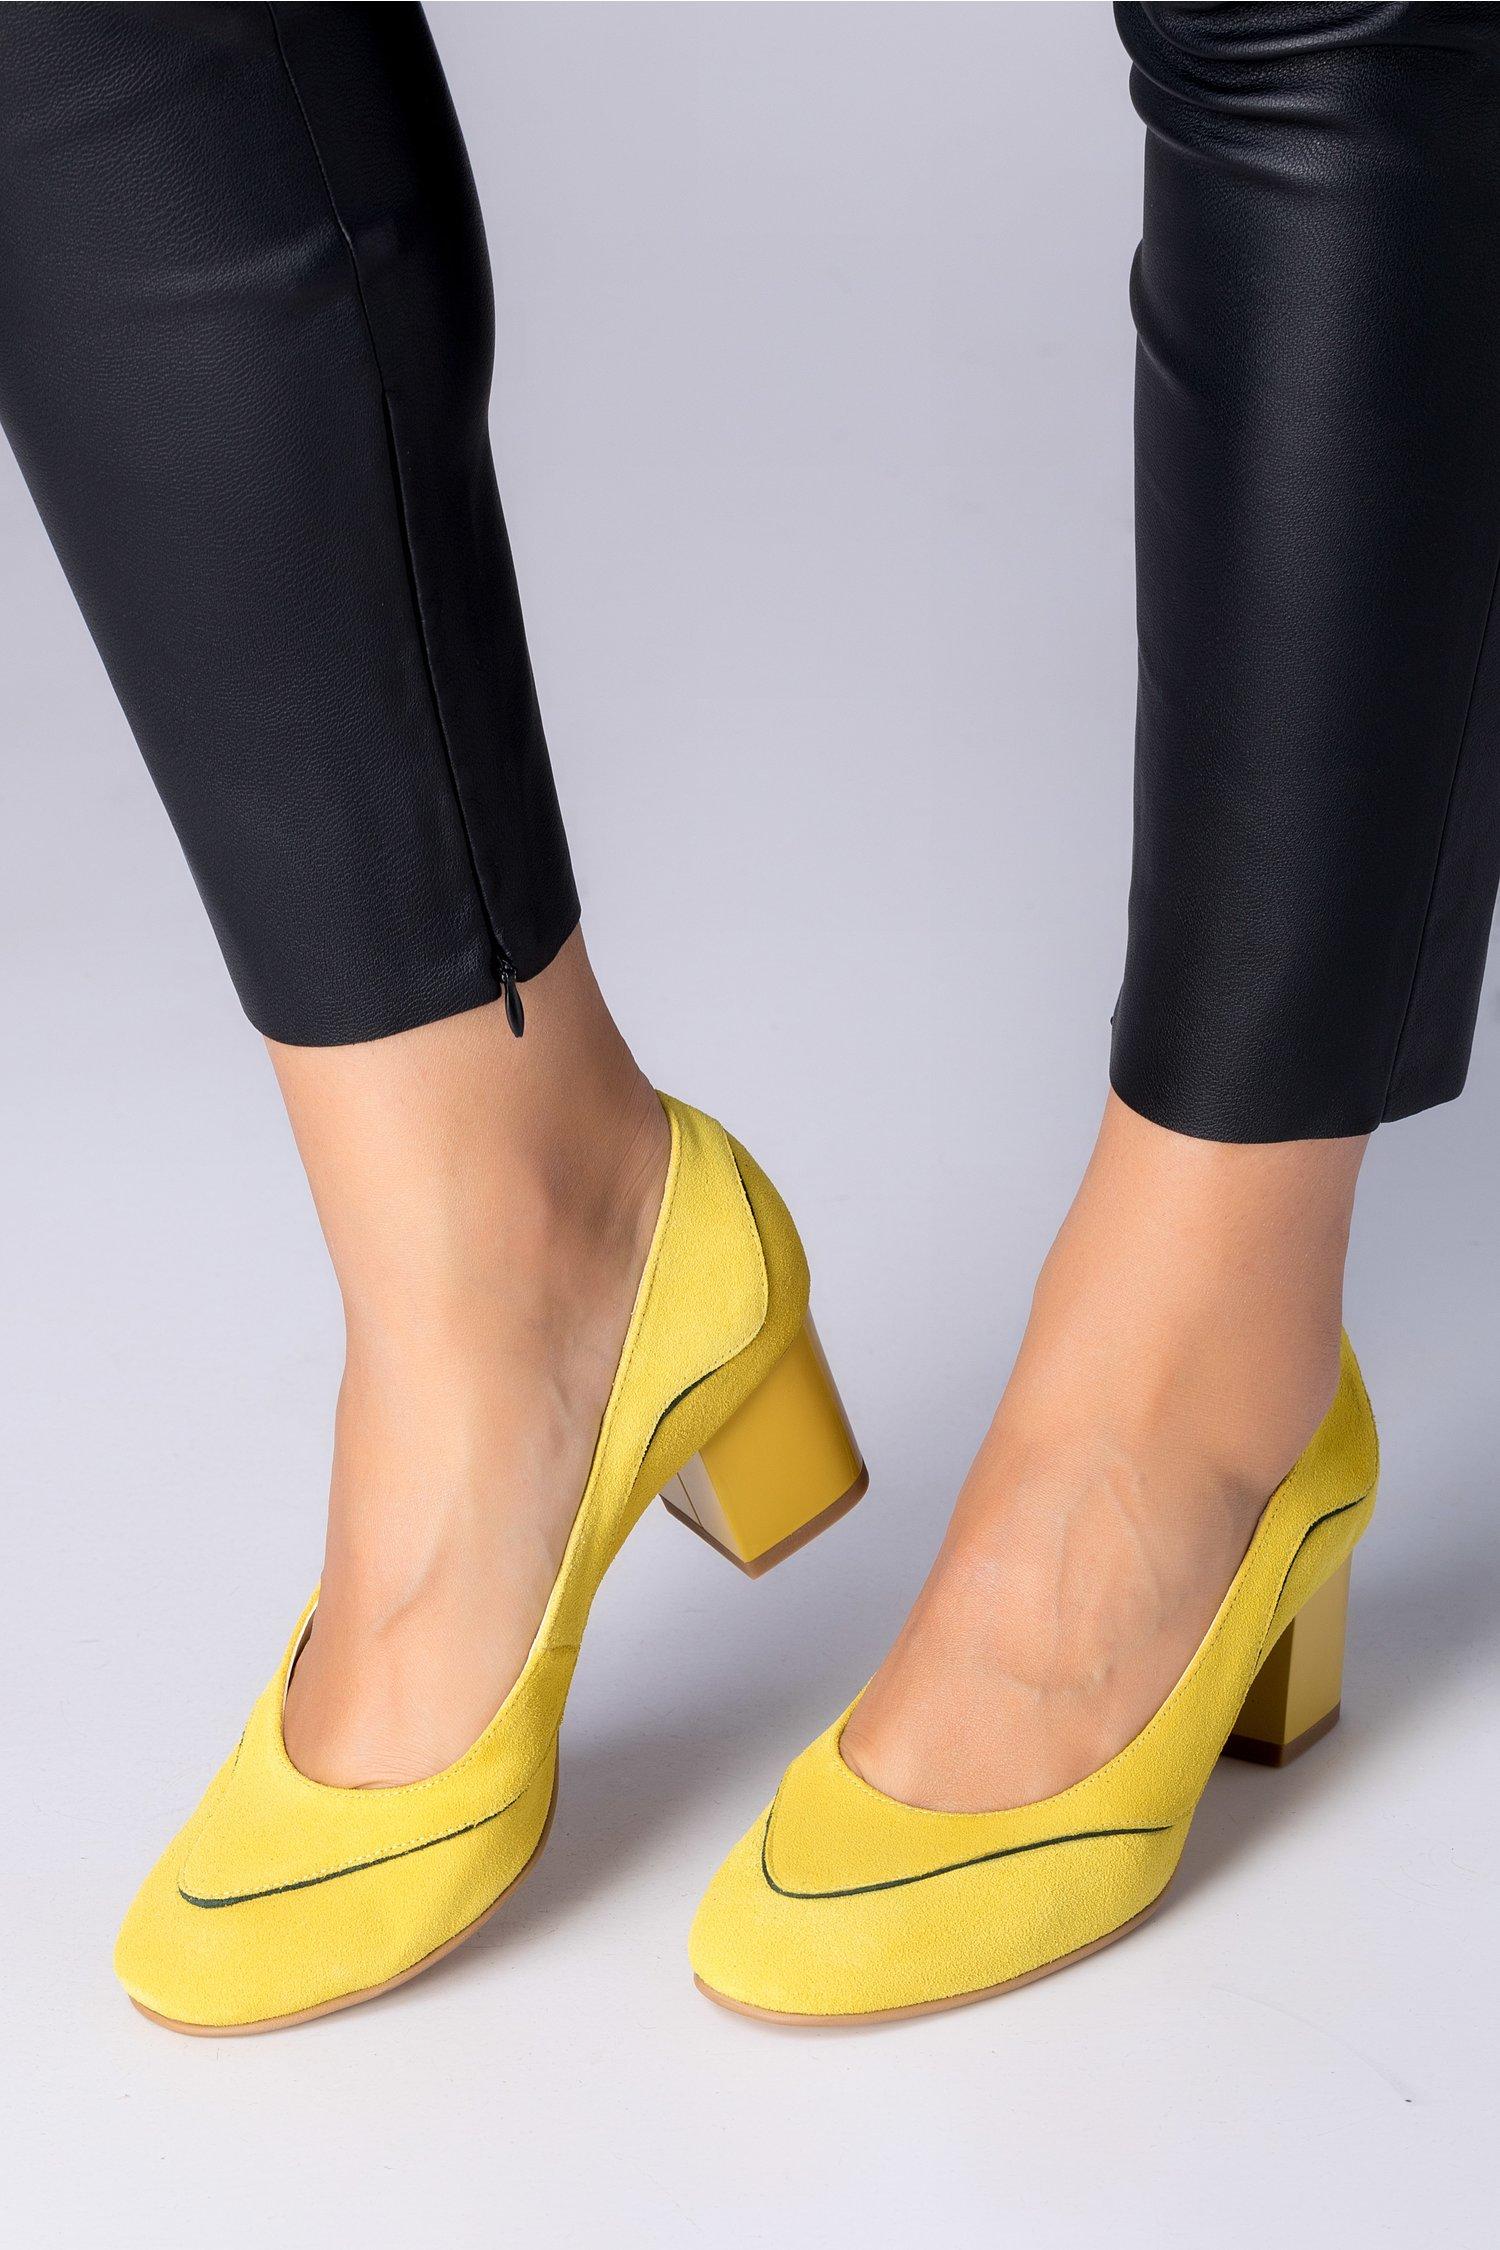 Pantofi galbeni din piele intoarsa cu detalii negre